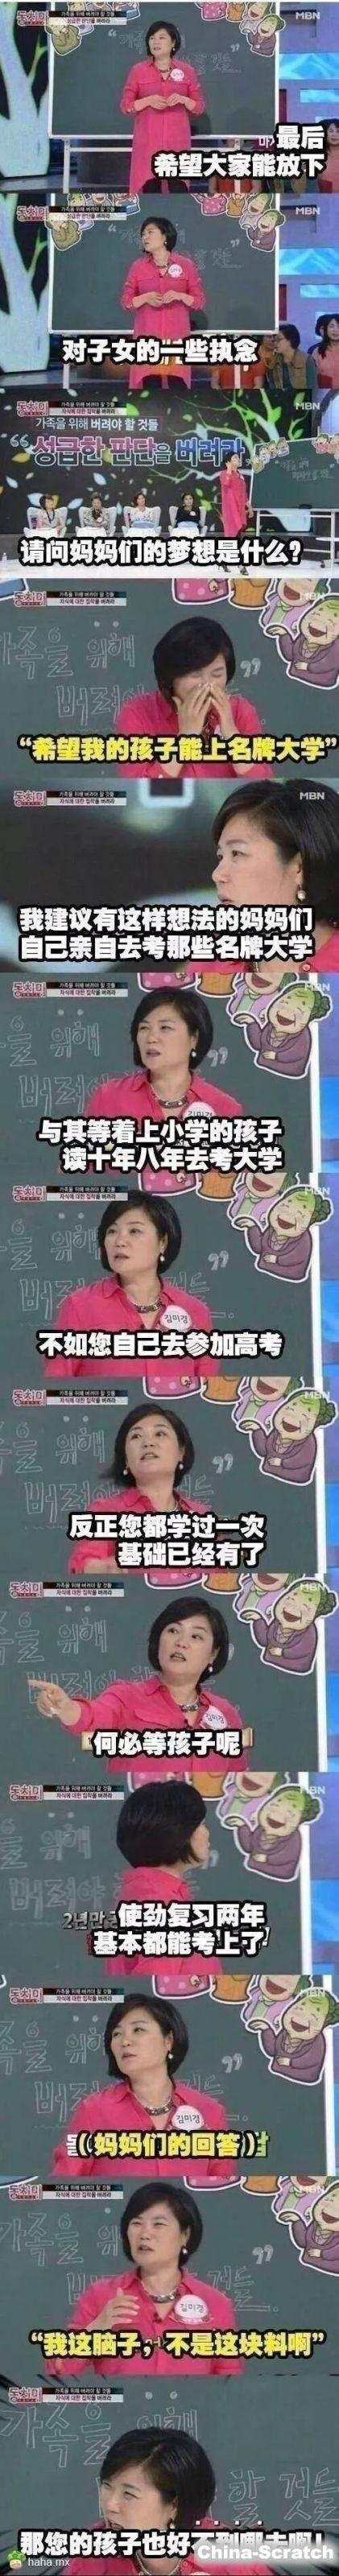 https://cdn.china-scratch.com/timg/180509/13133a645-1.jpg